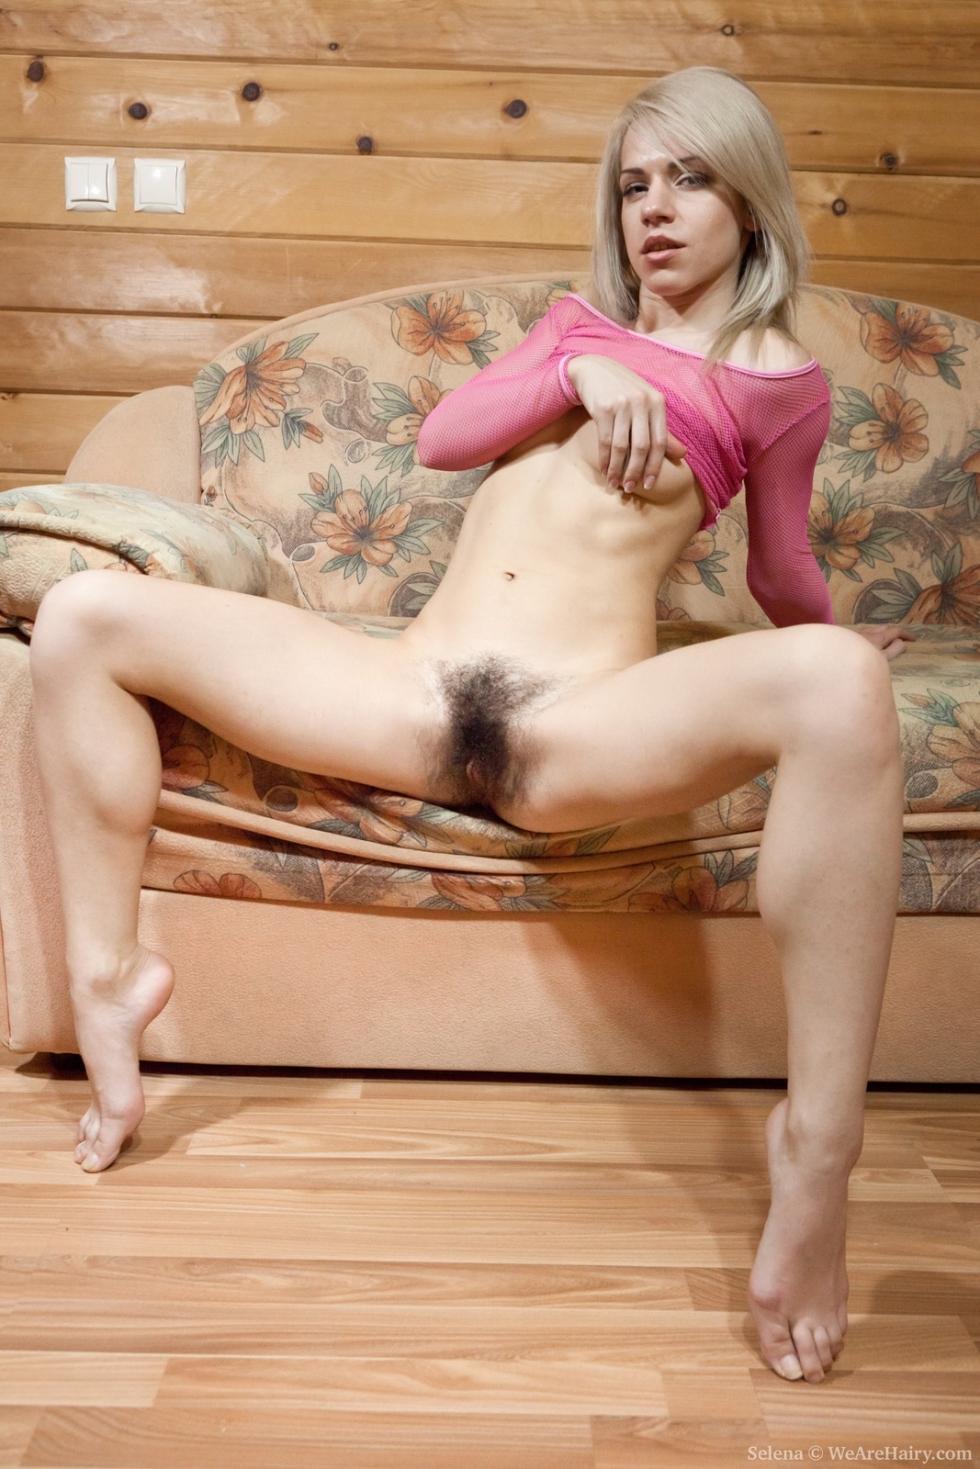 lpga women hairy pussy